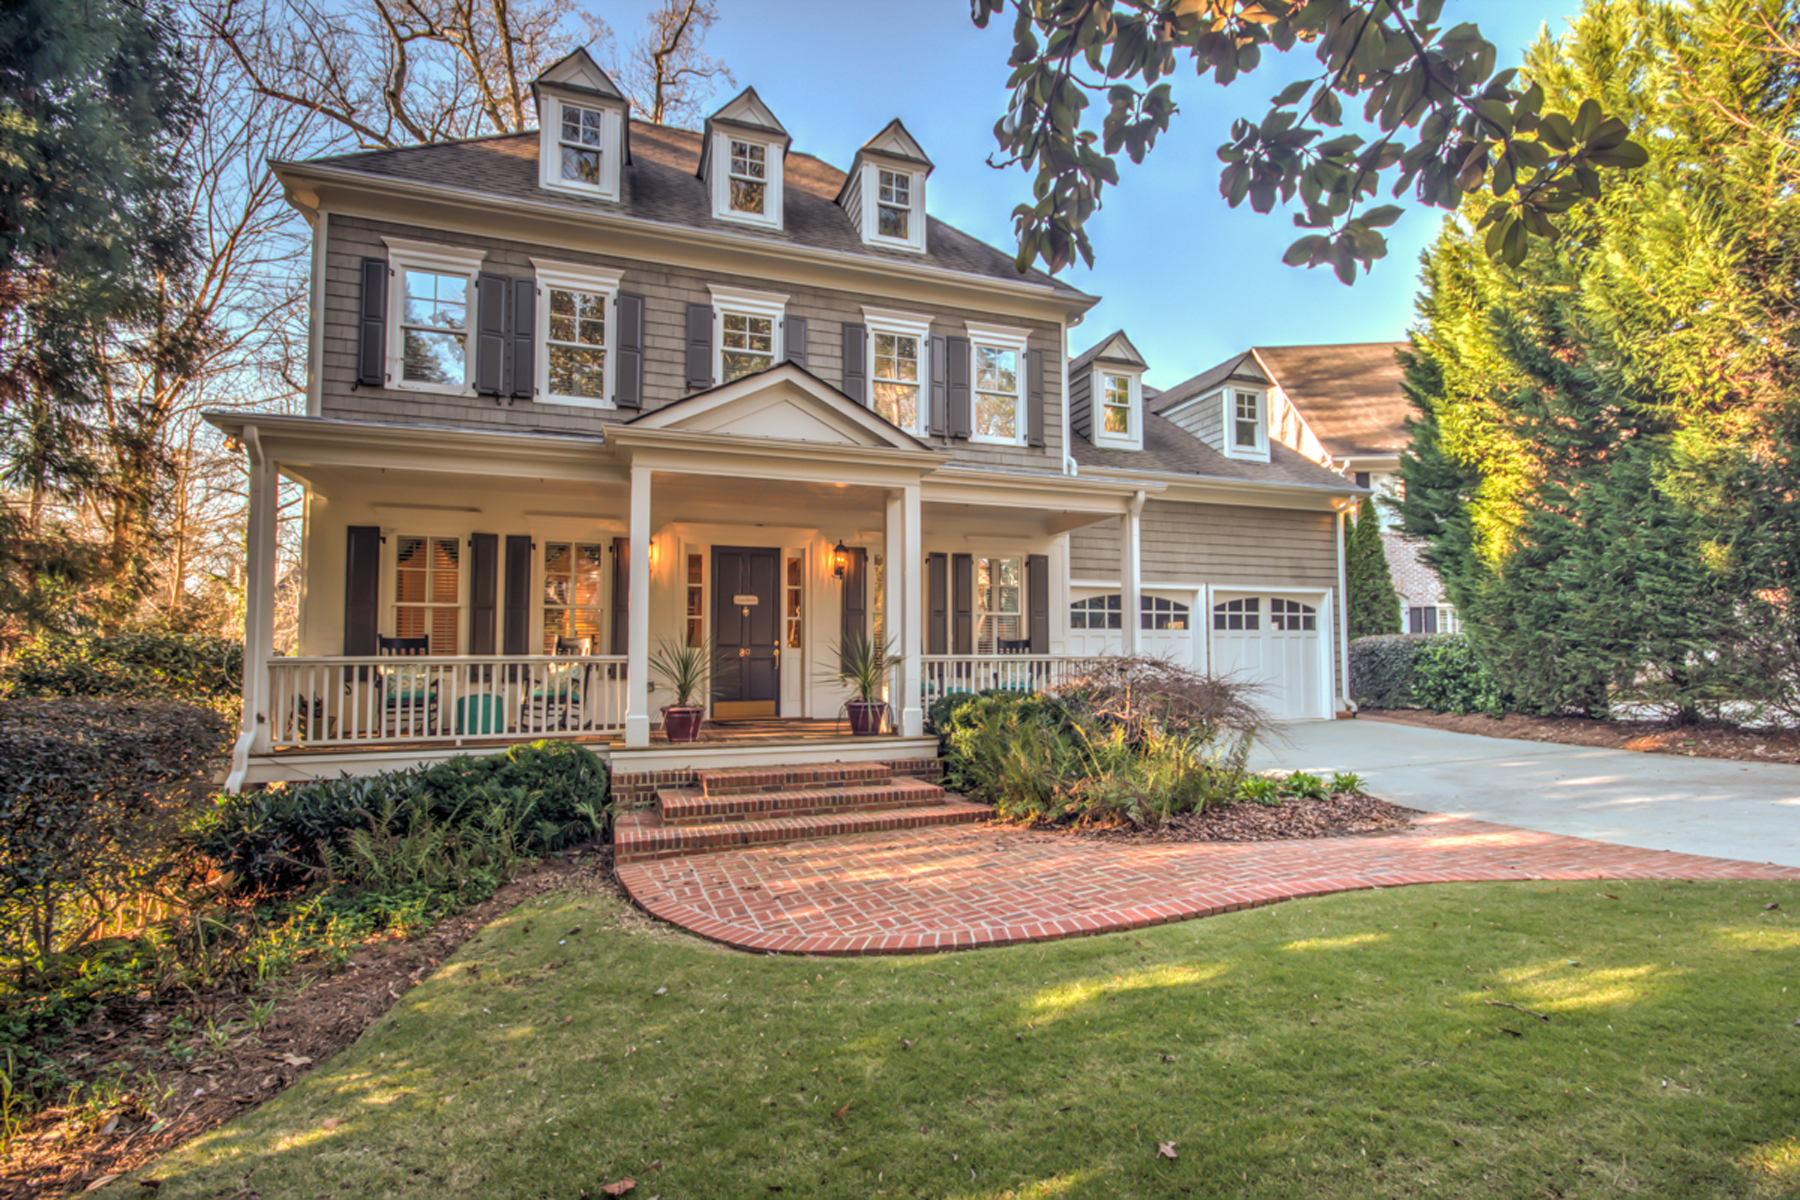 Single Family Home for Sale at Captivating Traditional Home 89 Honour Circle NW Buckhead, Atlanta, Georgia 30305 United States